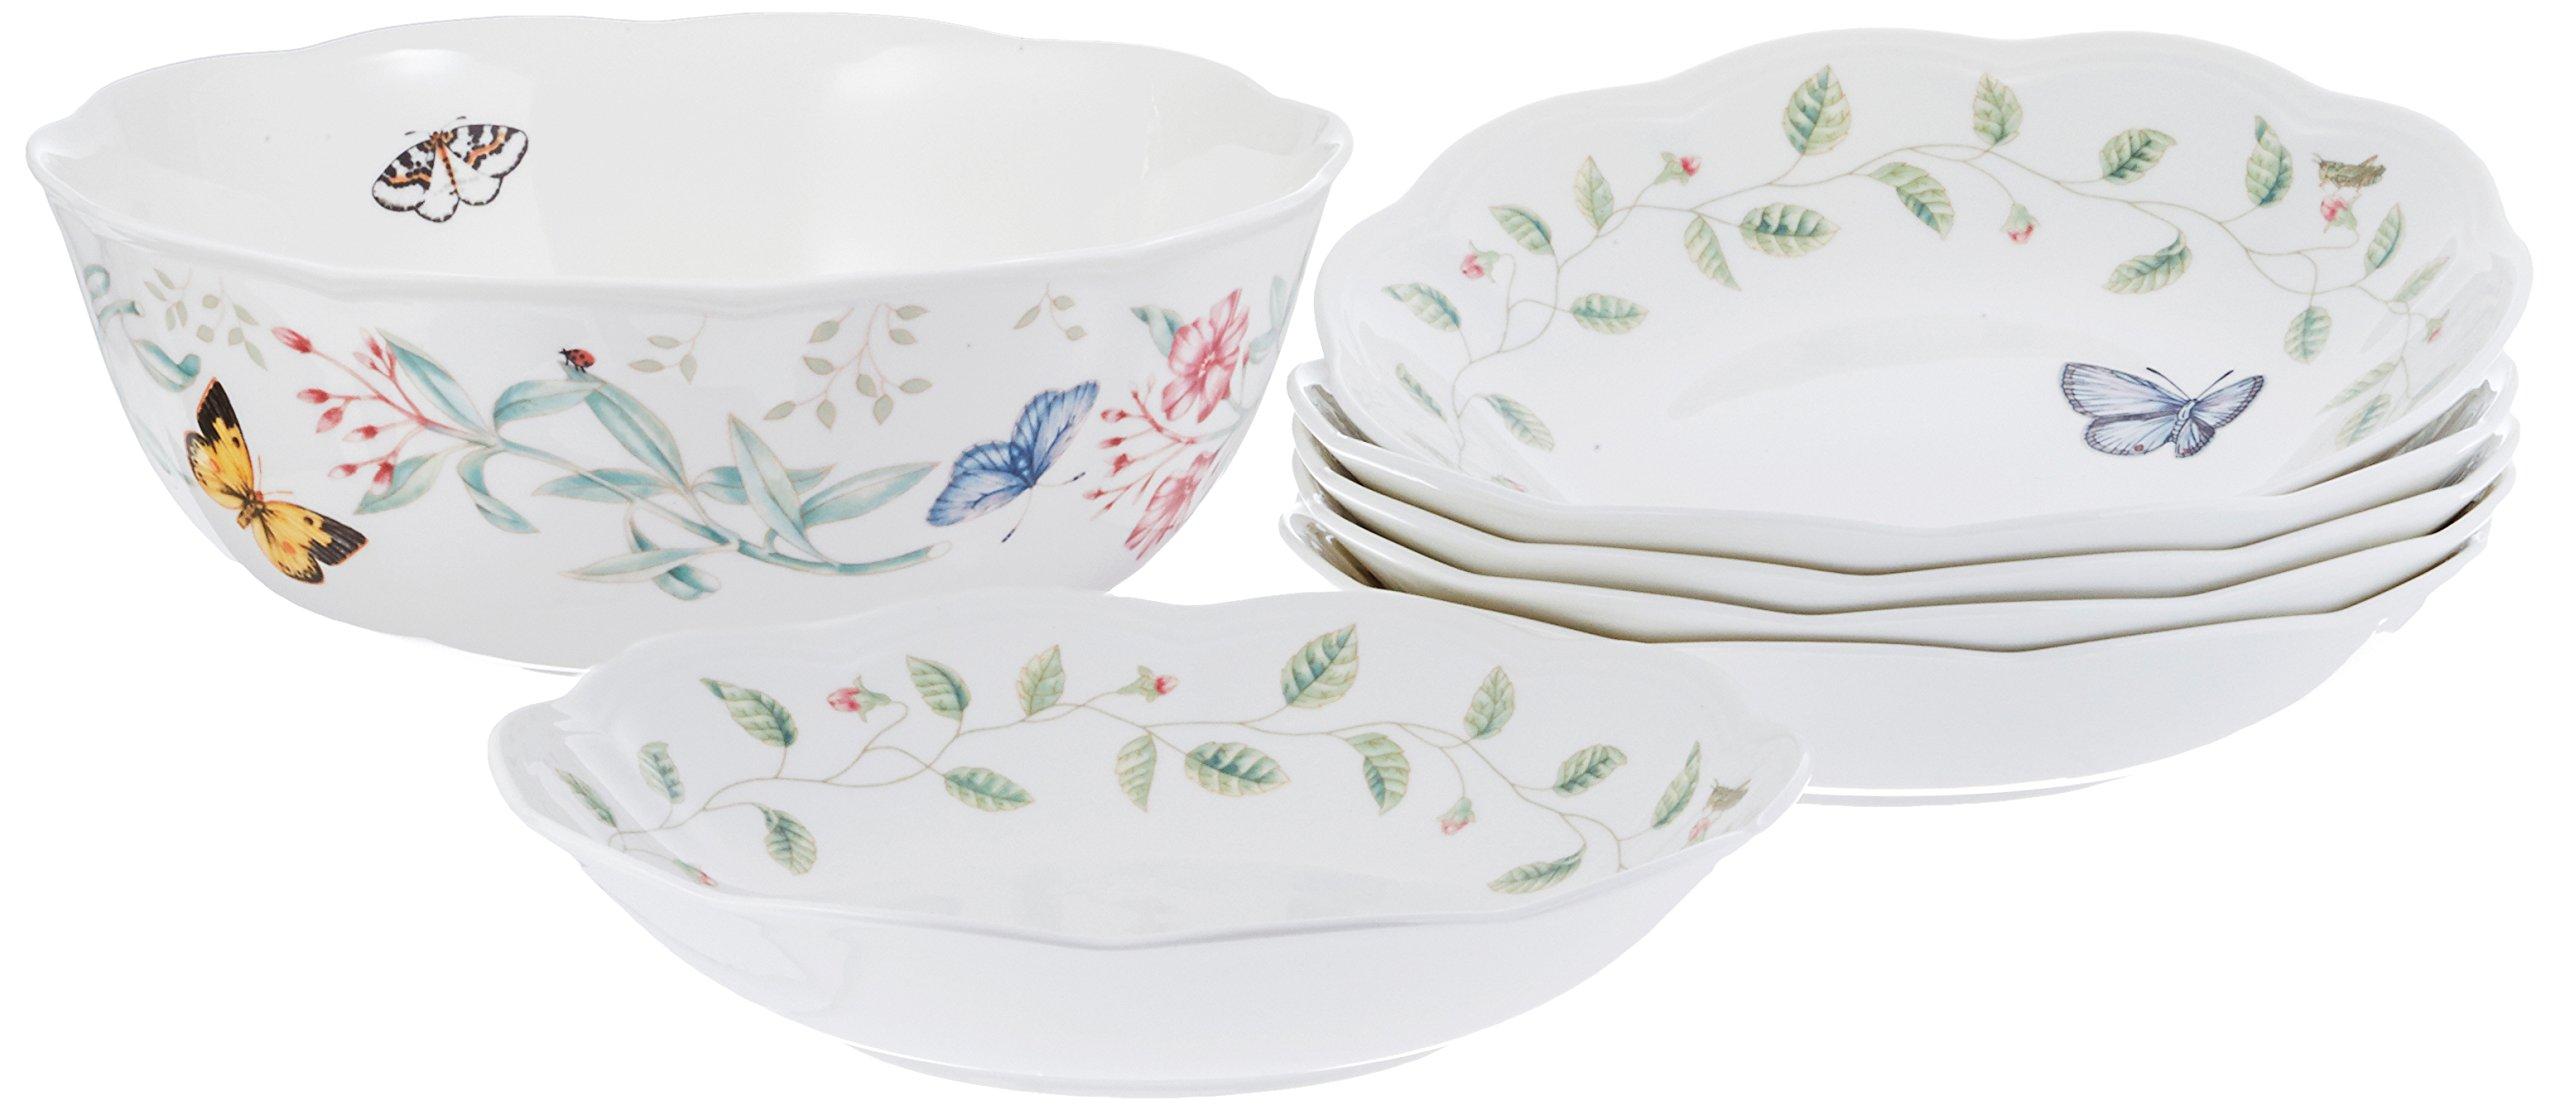 Lenox Butterfly Meadow 7 Piece Pasta/Salad Set White Dinnerware